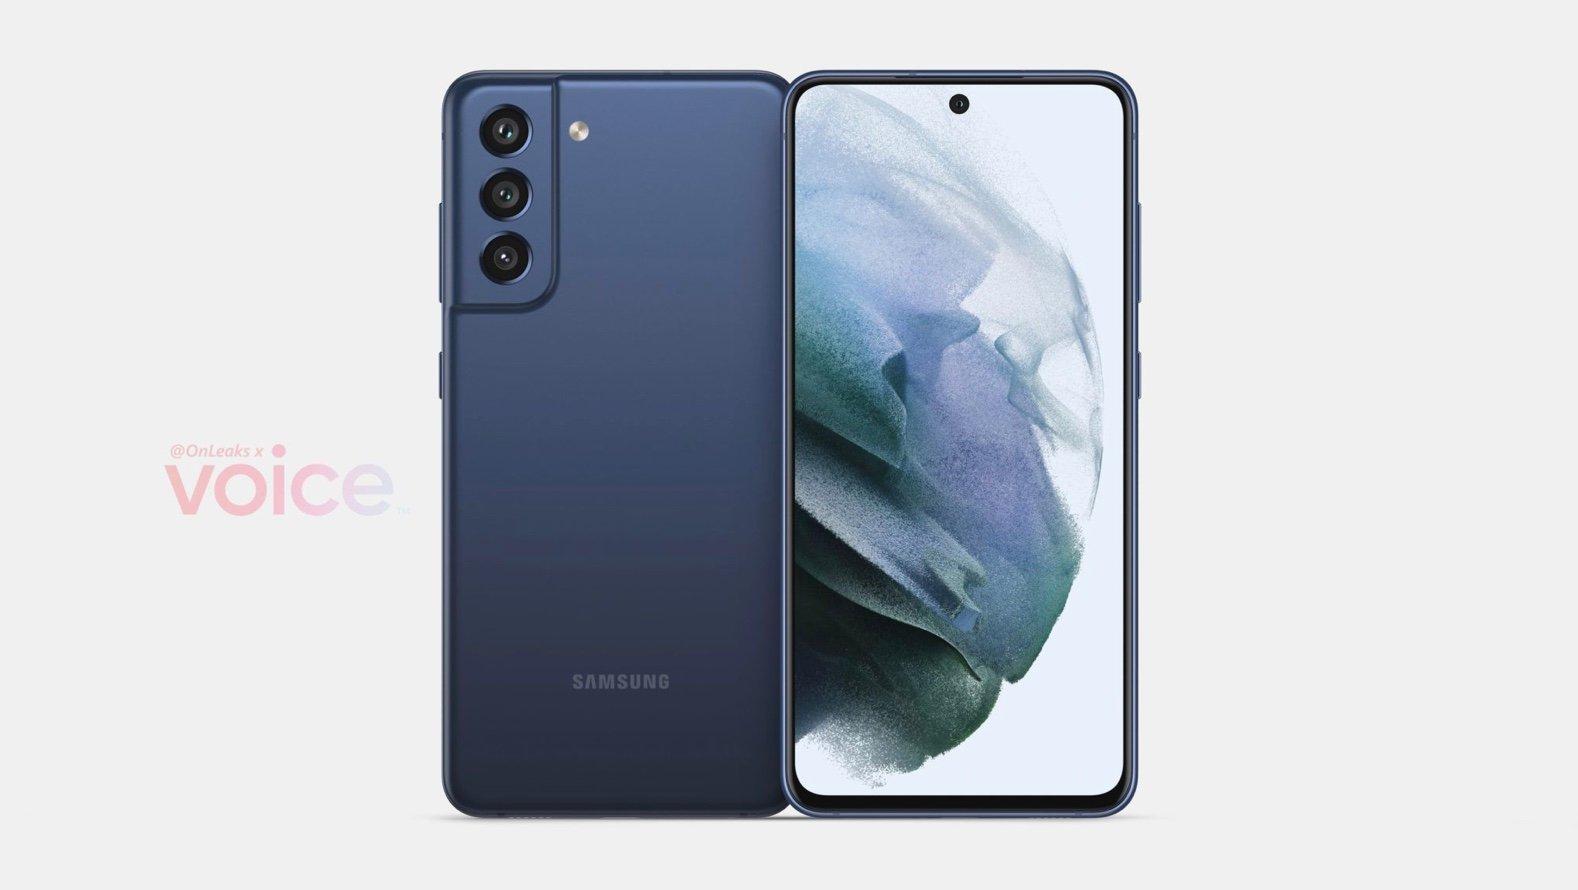 Samsung Galaxy S21 FE fot. Voice